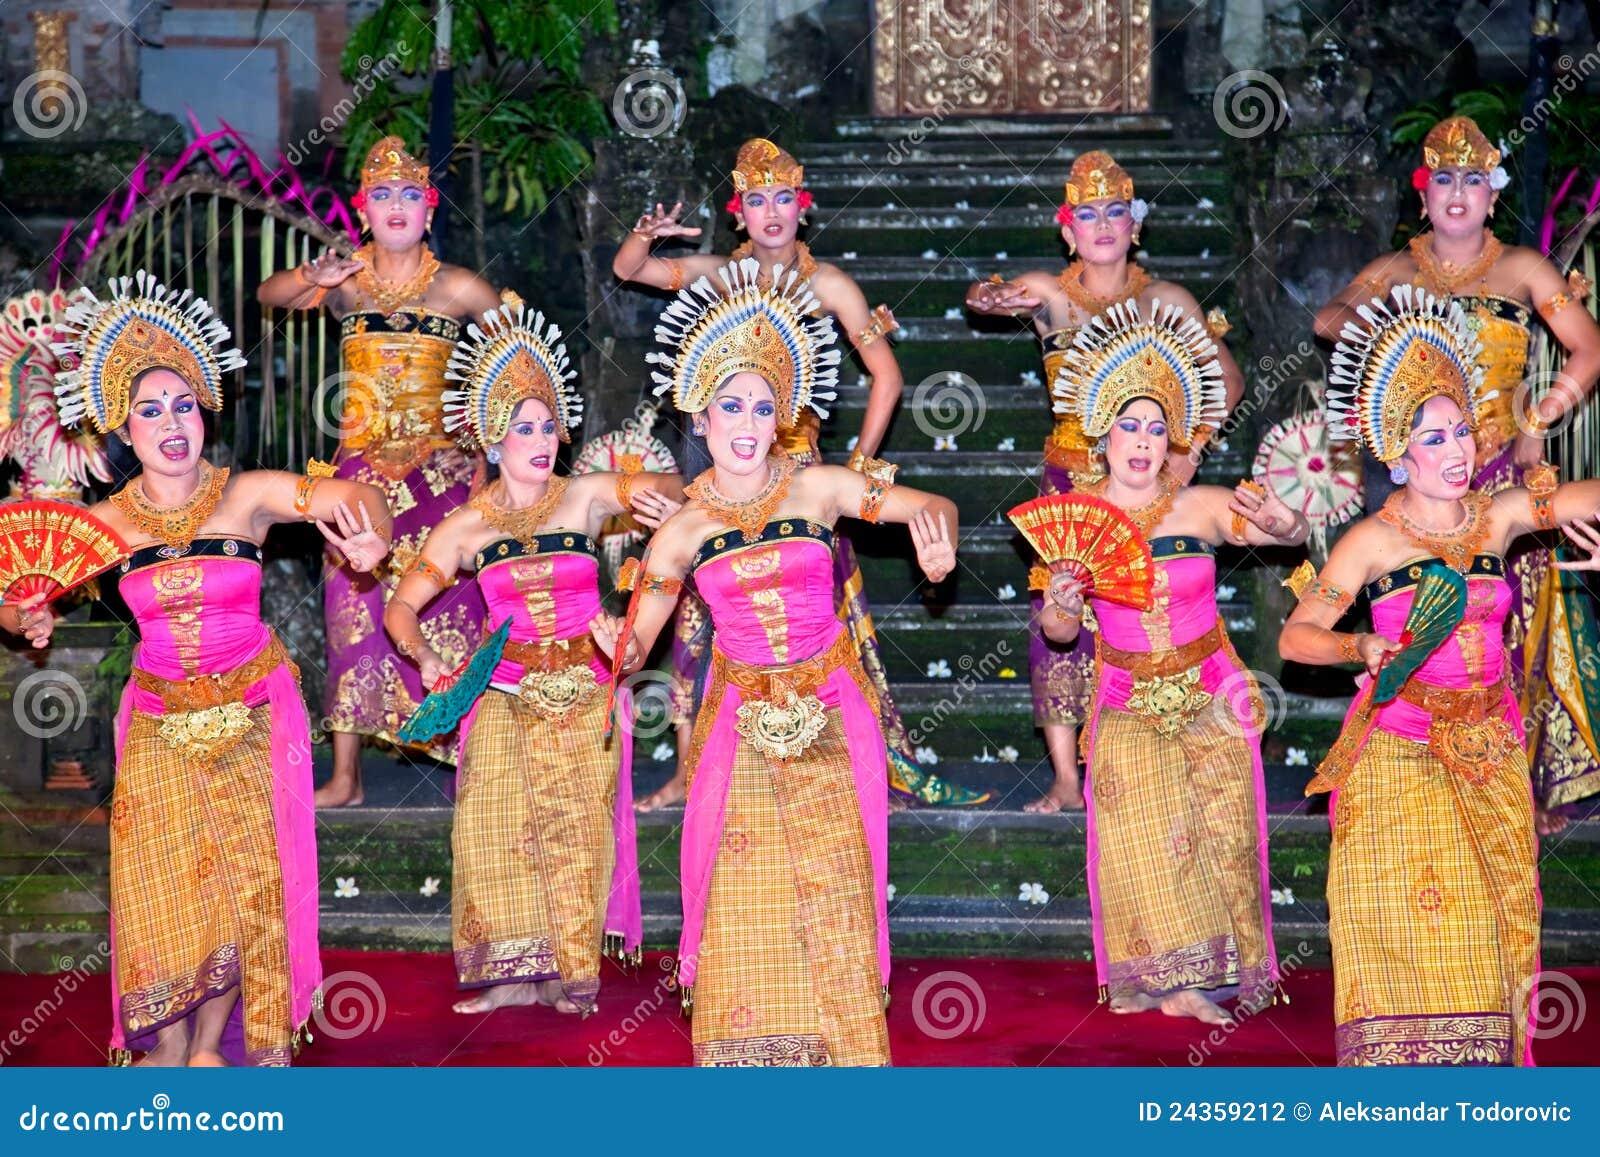 Janger Dance Ubud Bali Indonesia Editorial Photography